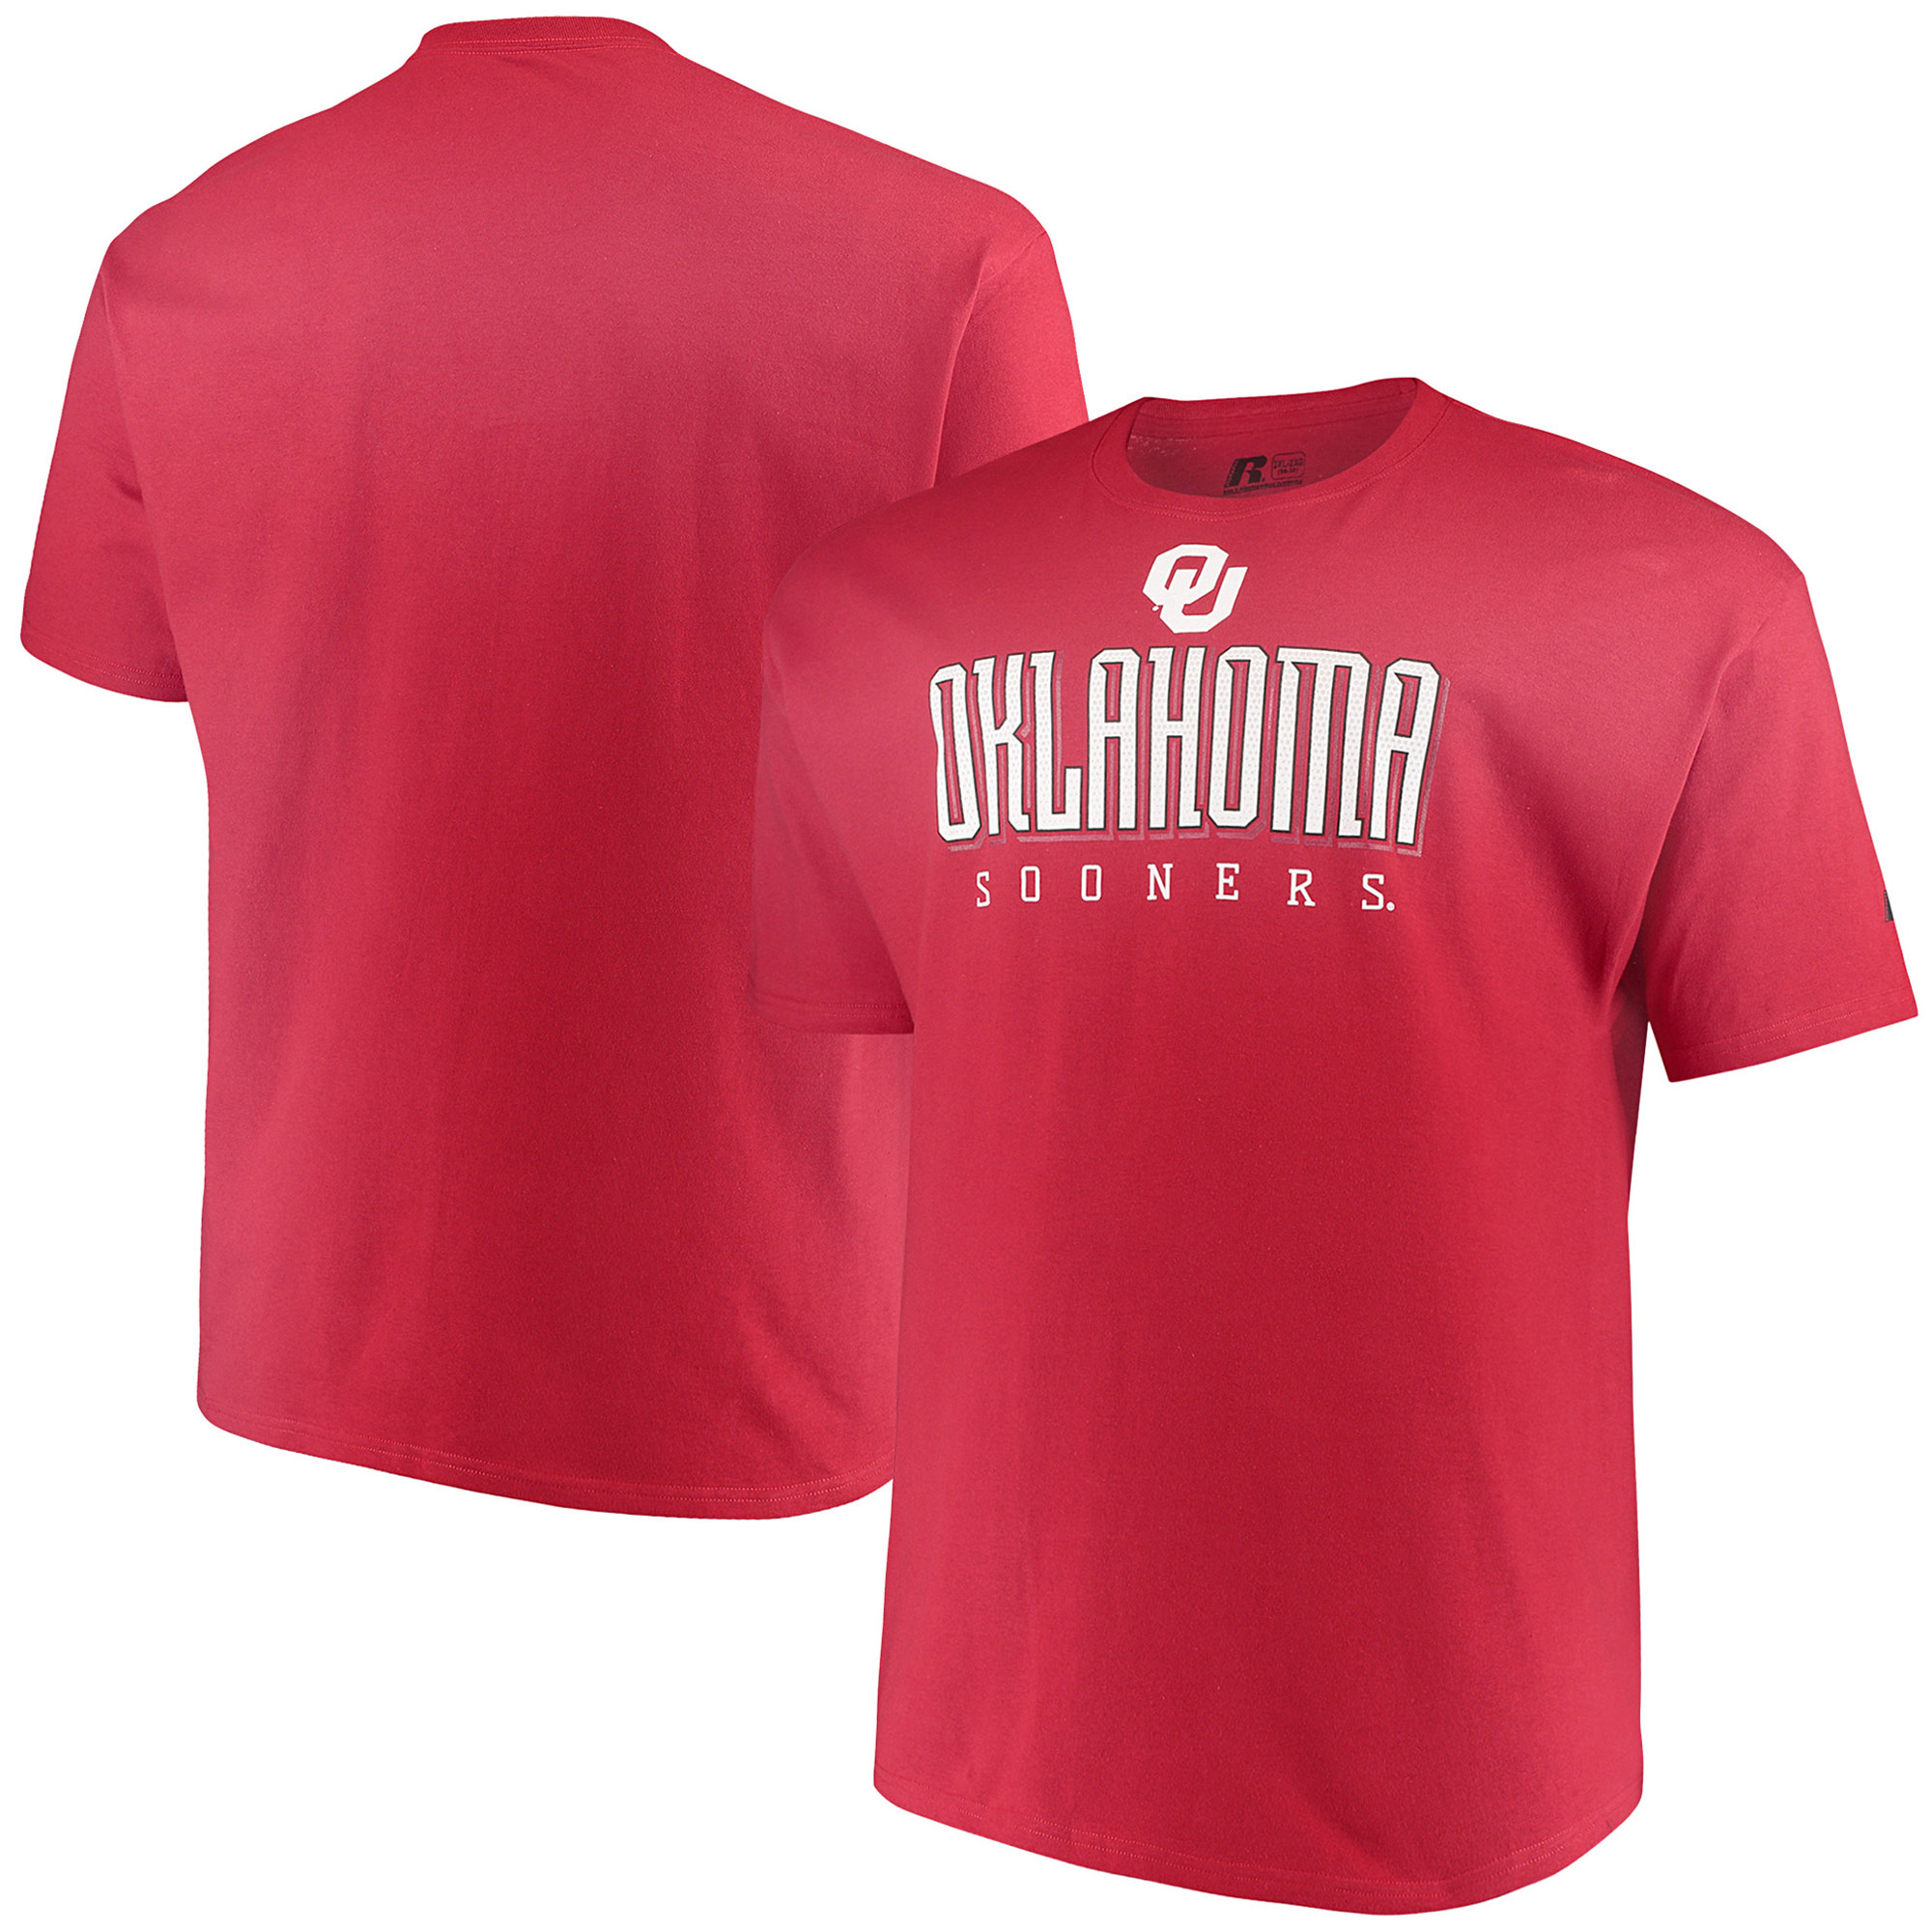 info for c49bb 7176c Oklahoma Sooners Team Shop - Walmart.com